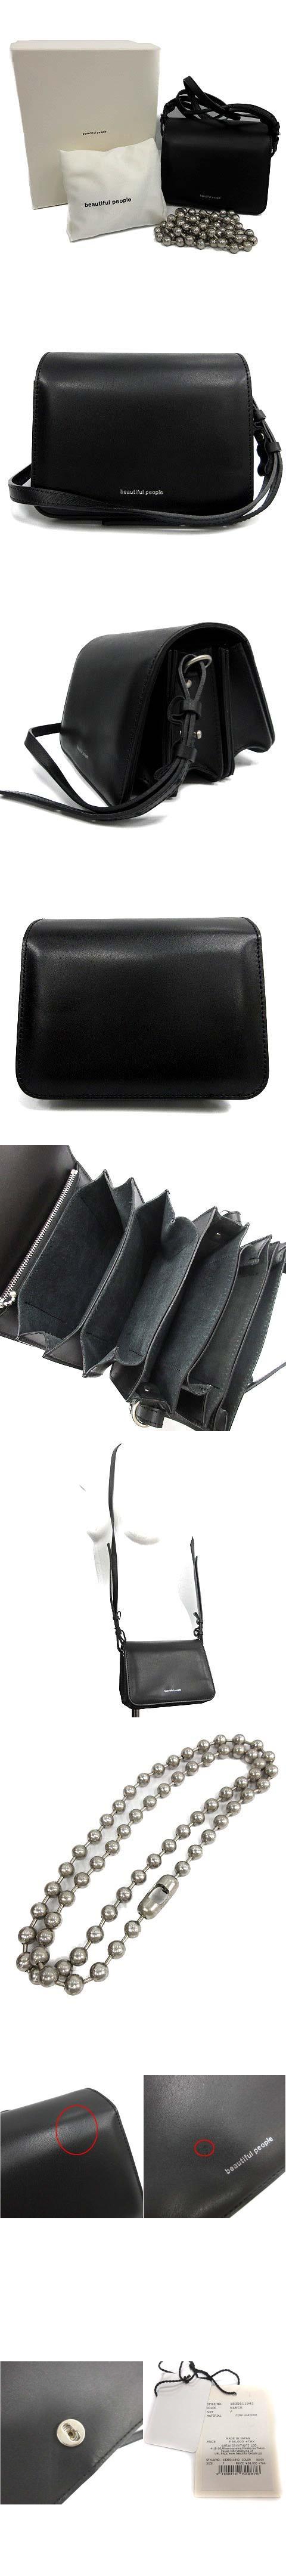 smooth leather slant ing accordion bag ショルダーバッグ 2WAY レザー ボールチェーン 黒 1835611942 /☆K